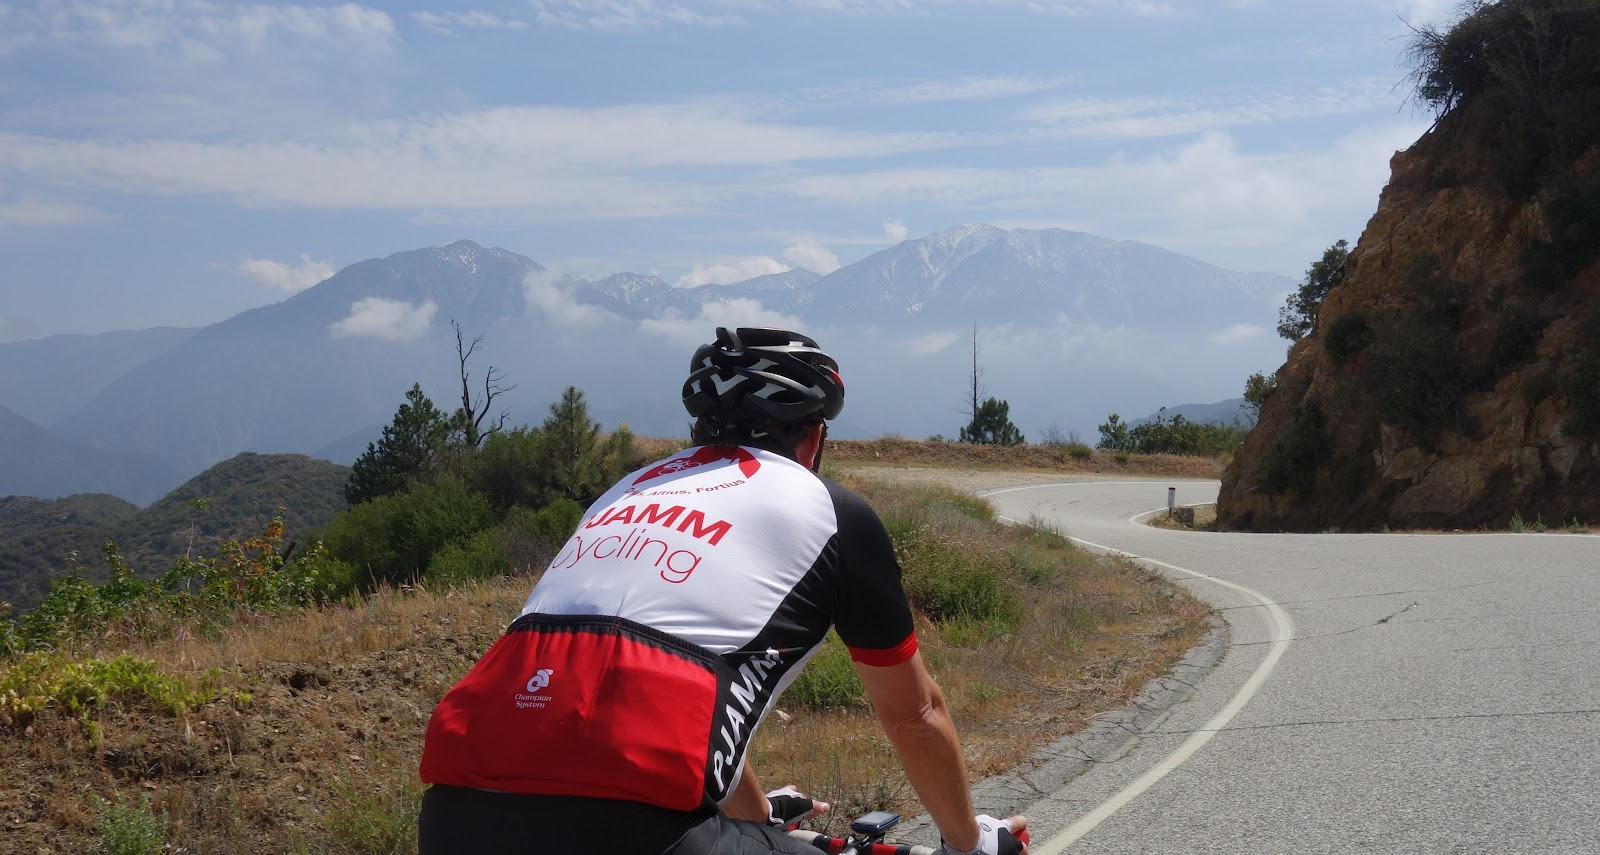 PJAMM cyclist riding bike up Glendora Mountain Road from Glendora CA